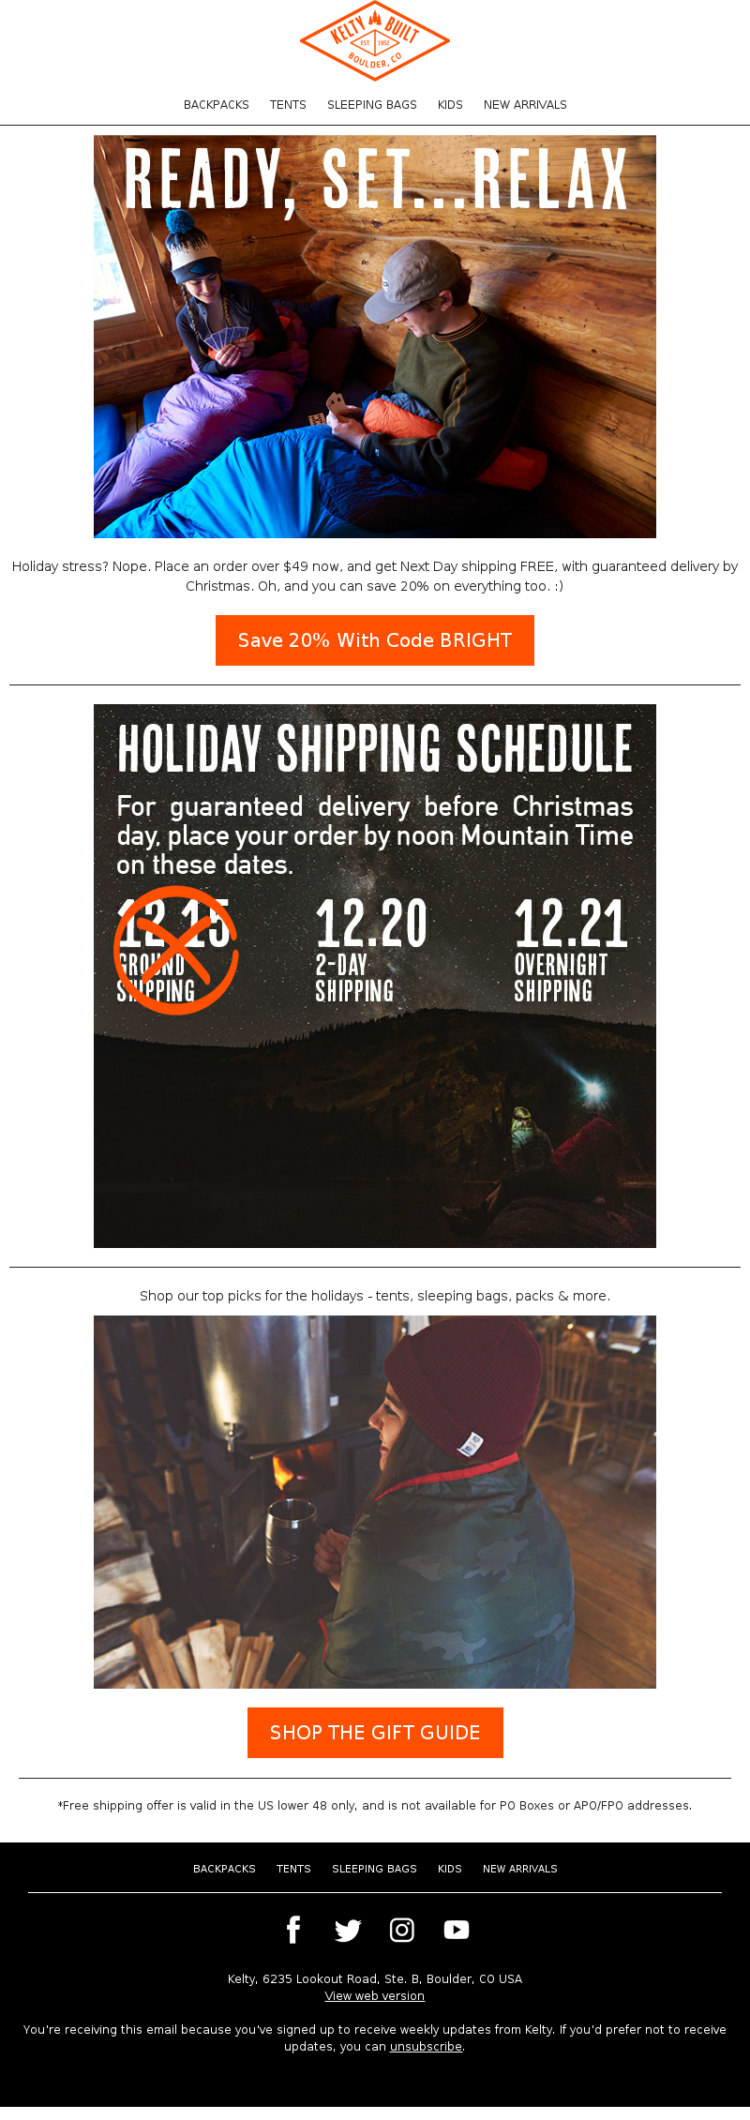 Email vacanza Marekting Kelty Natale